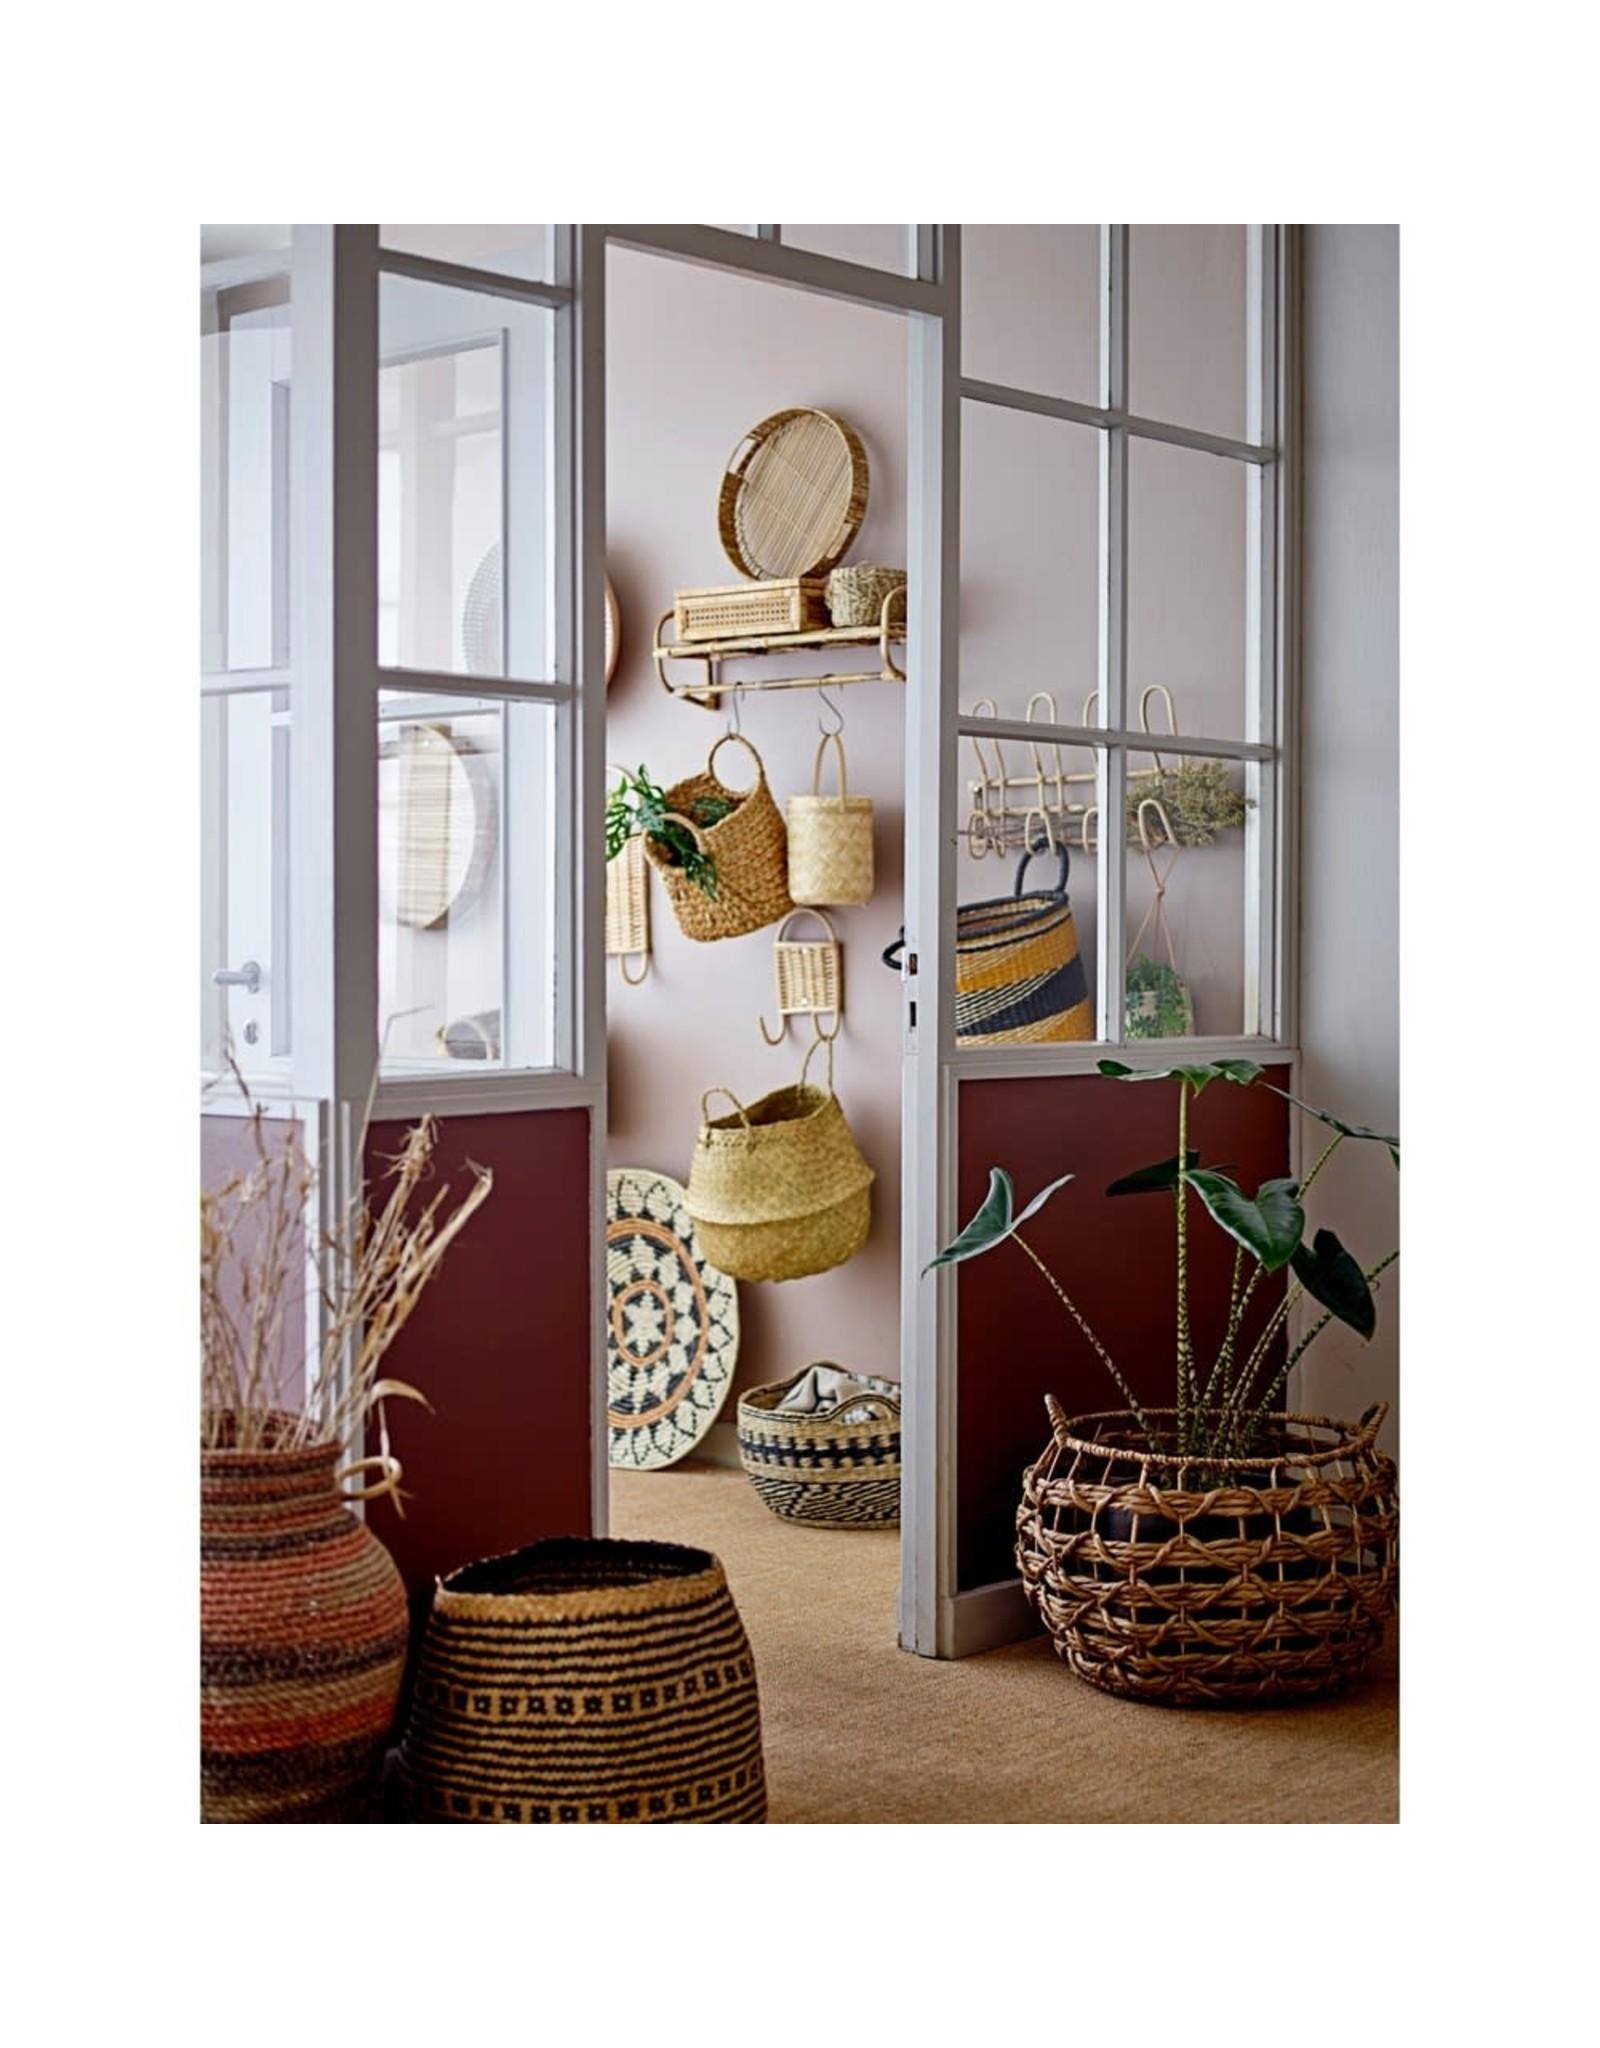 Oak + Arrow Interiors Woven Rattan & Wood Display Box - Large